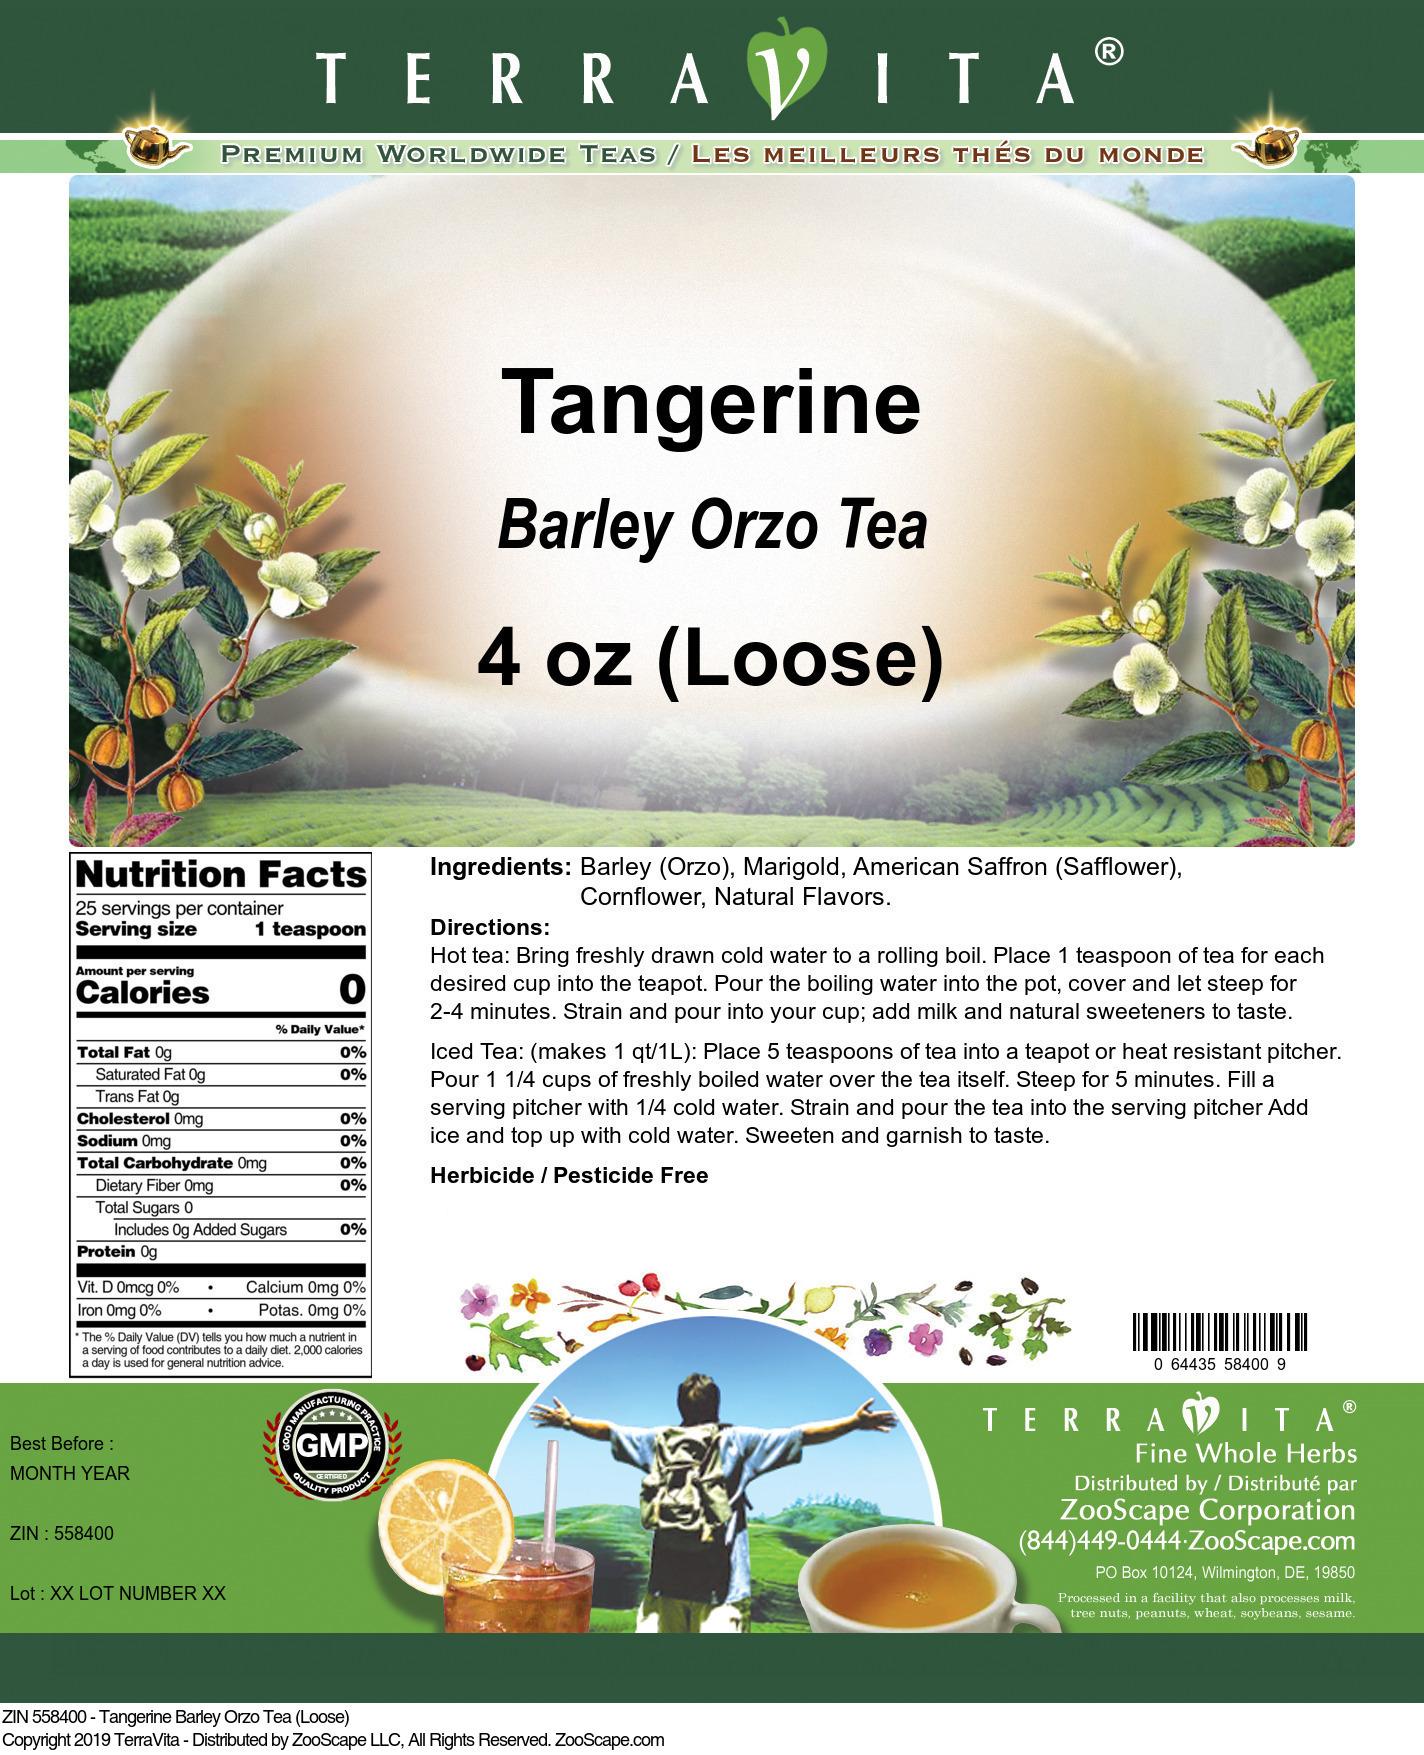 Tangerine Barley Orzo